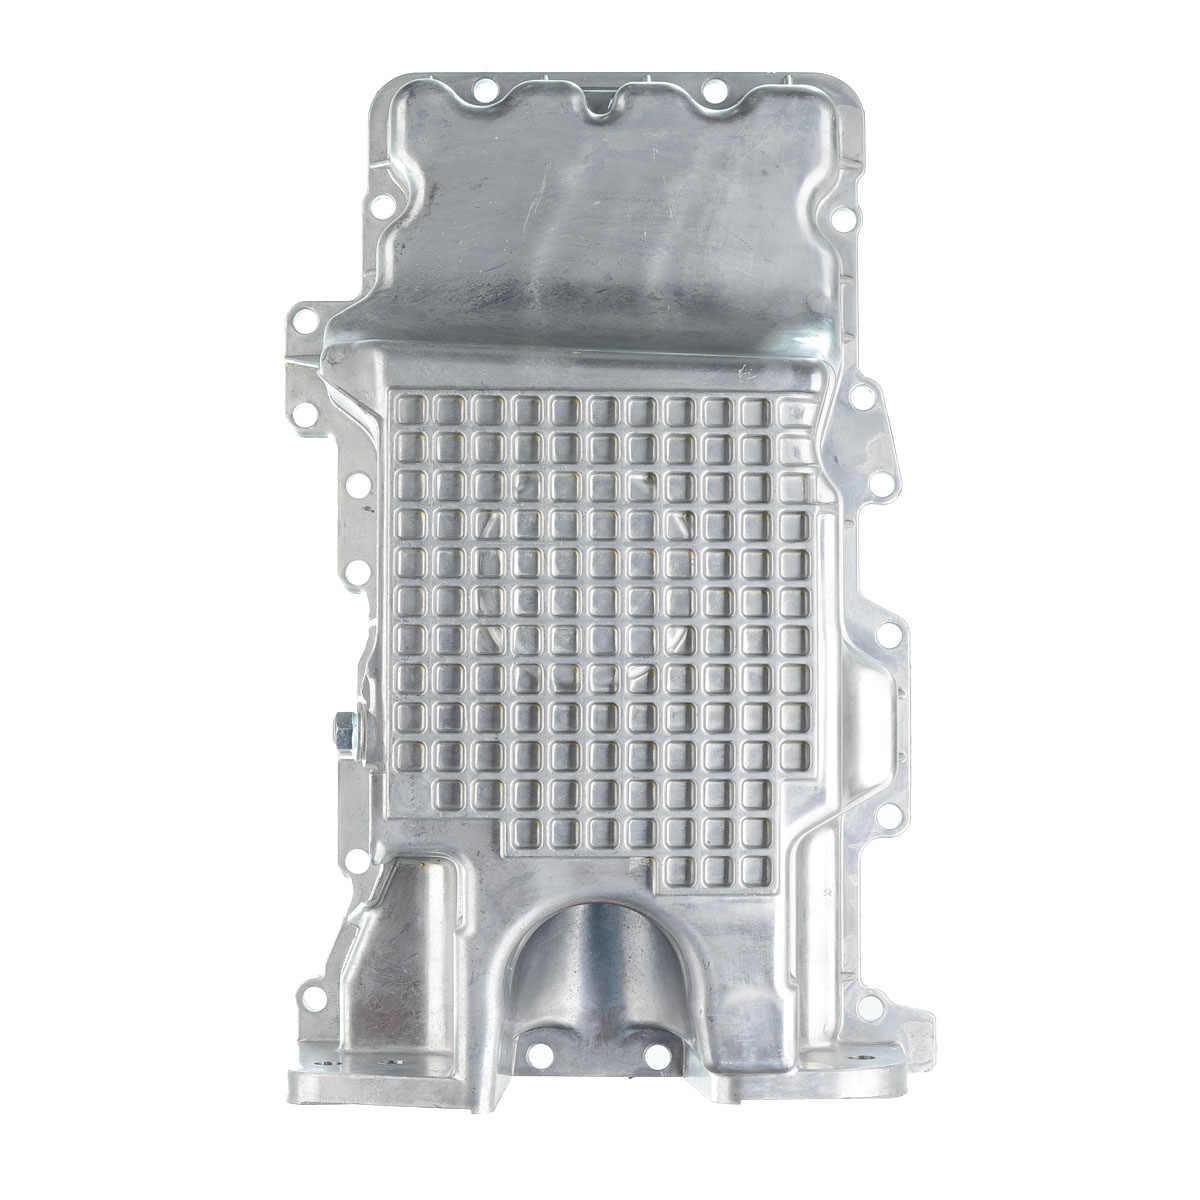 medium resolution of engine oil pan for ford escape cougar mariner mazda 6 mpv tribute v6 2 5l 3 0